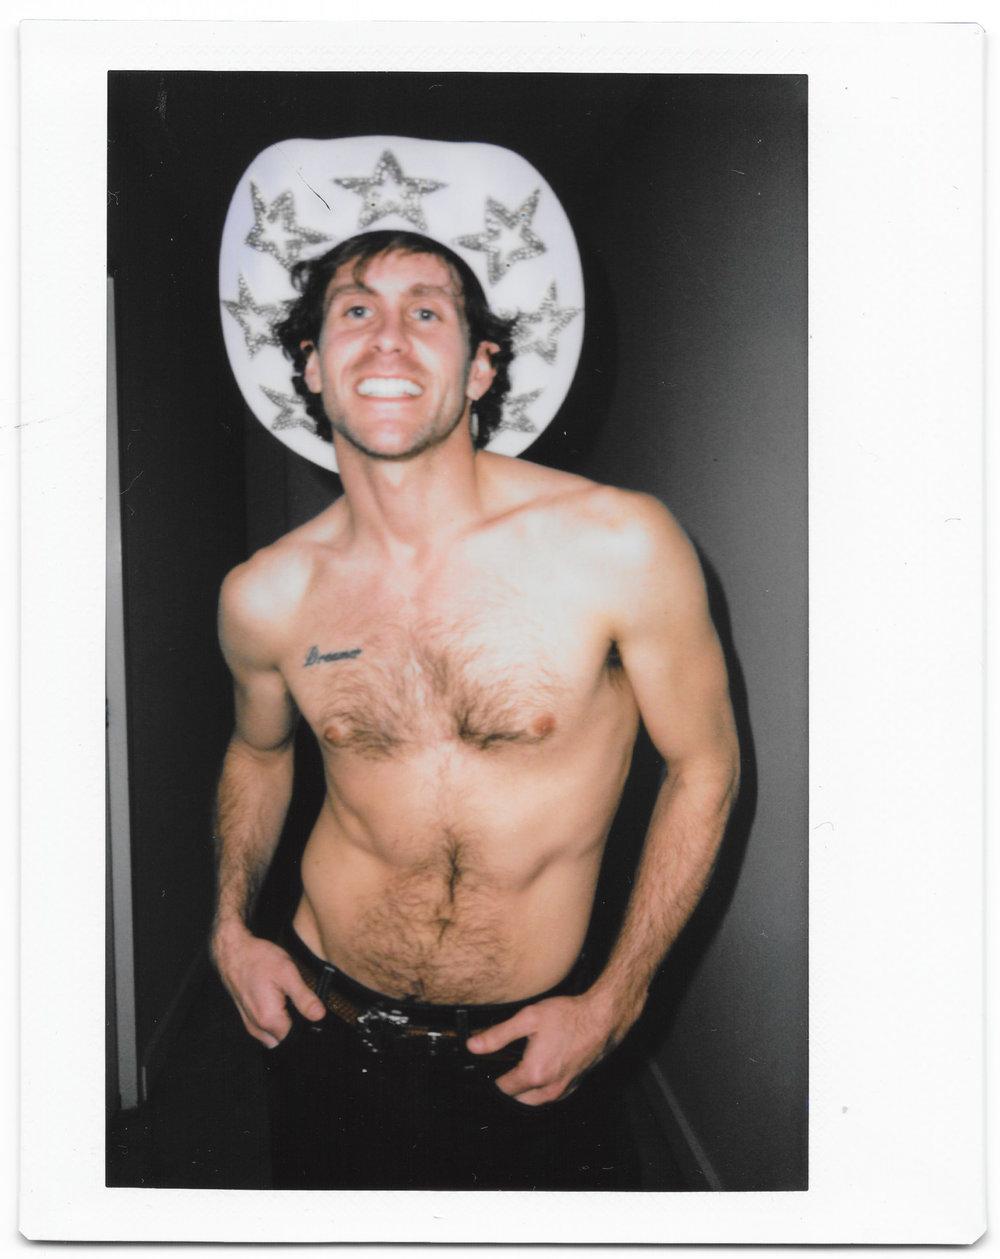 mark white cowboy hat 1.jpg